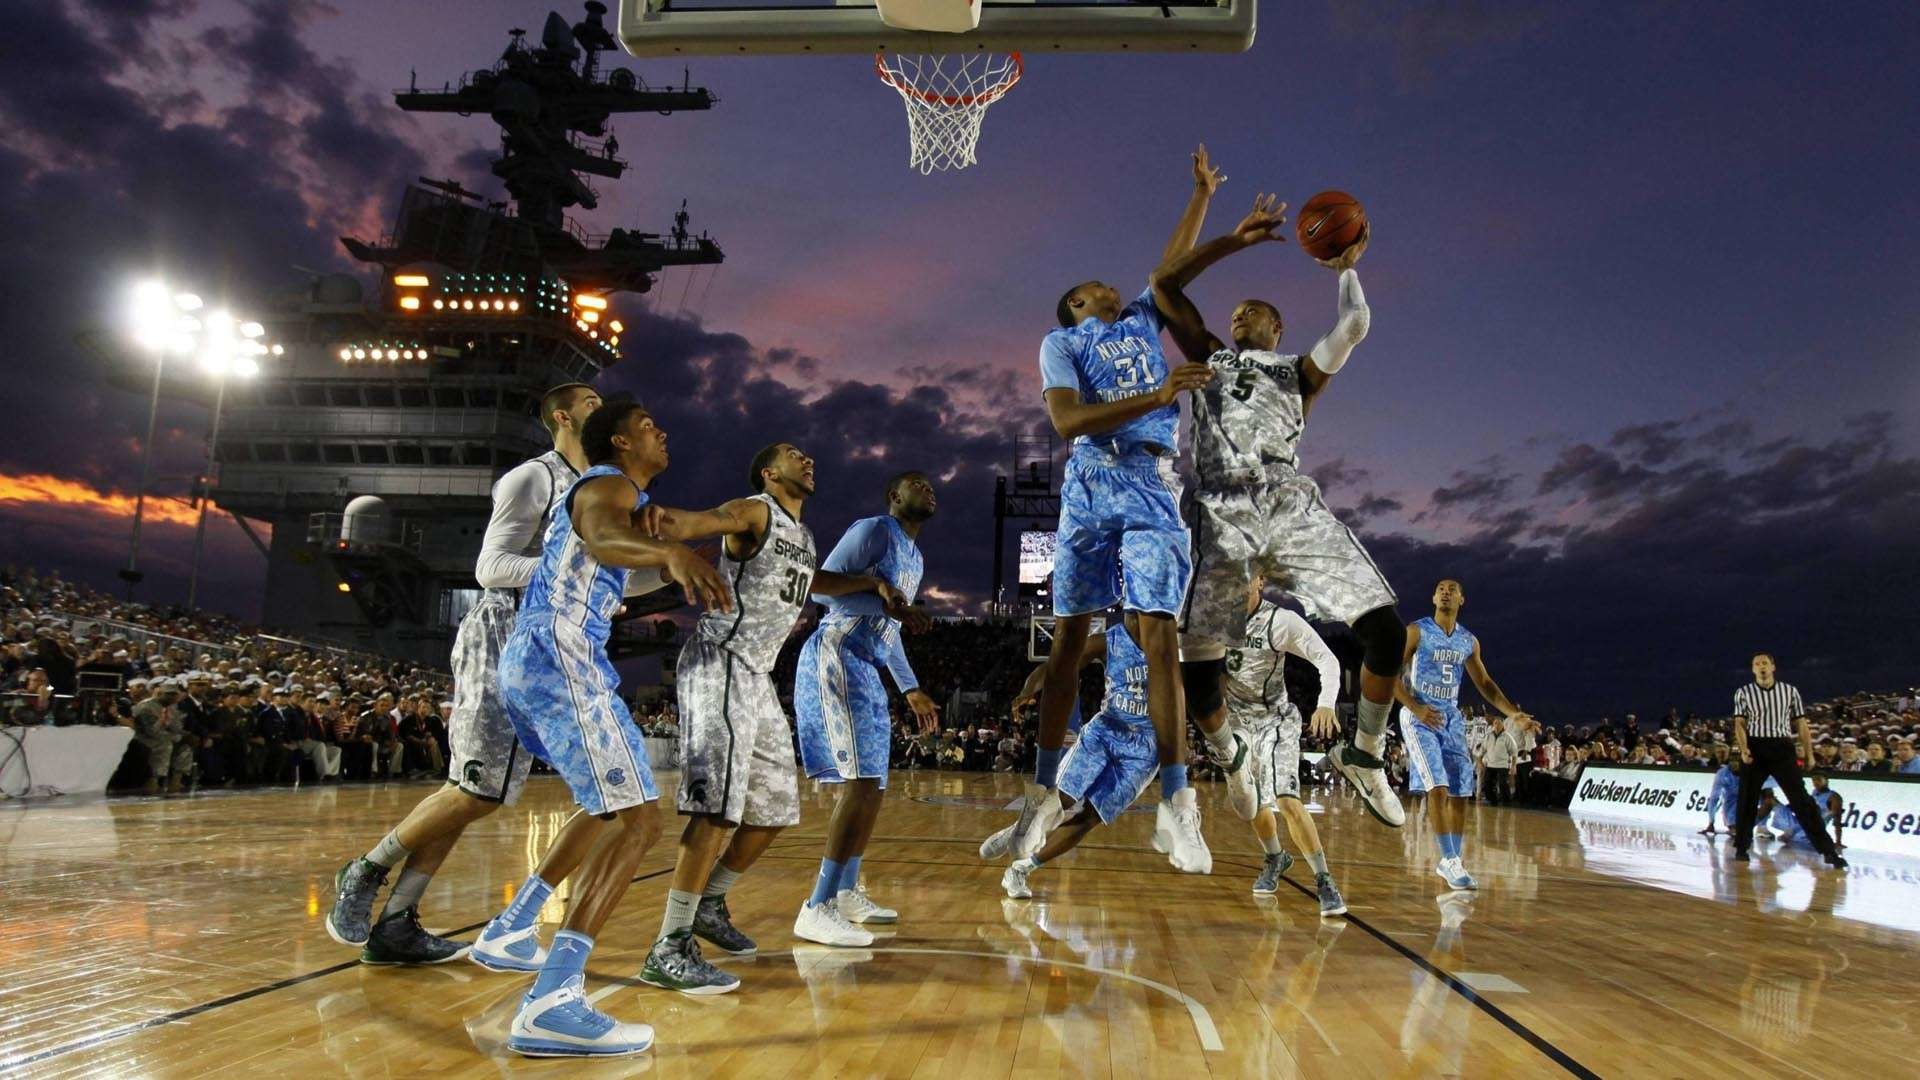 College Basketball Wallpaper